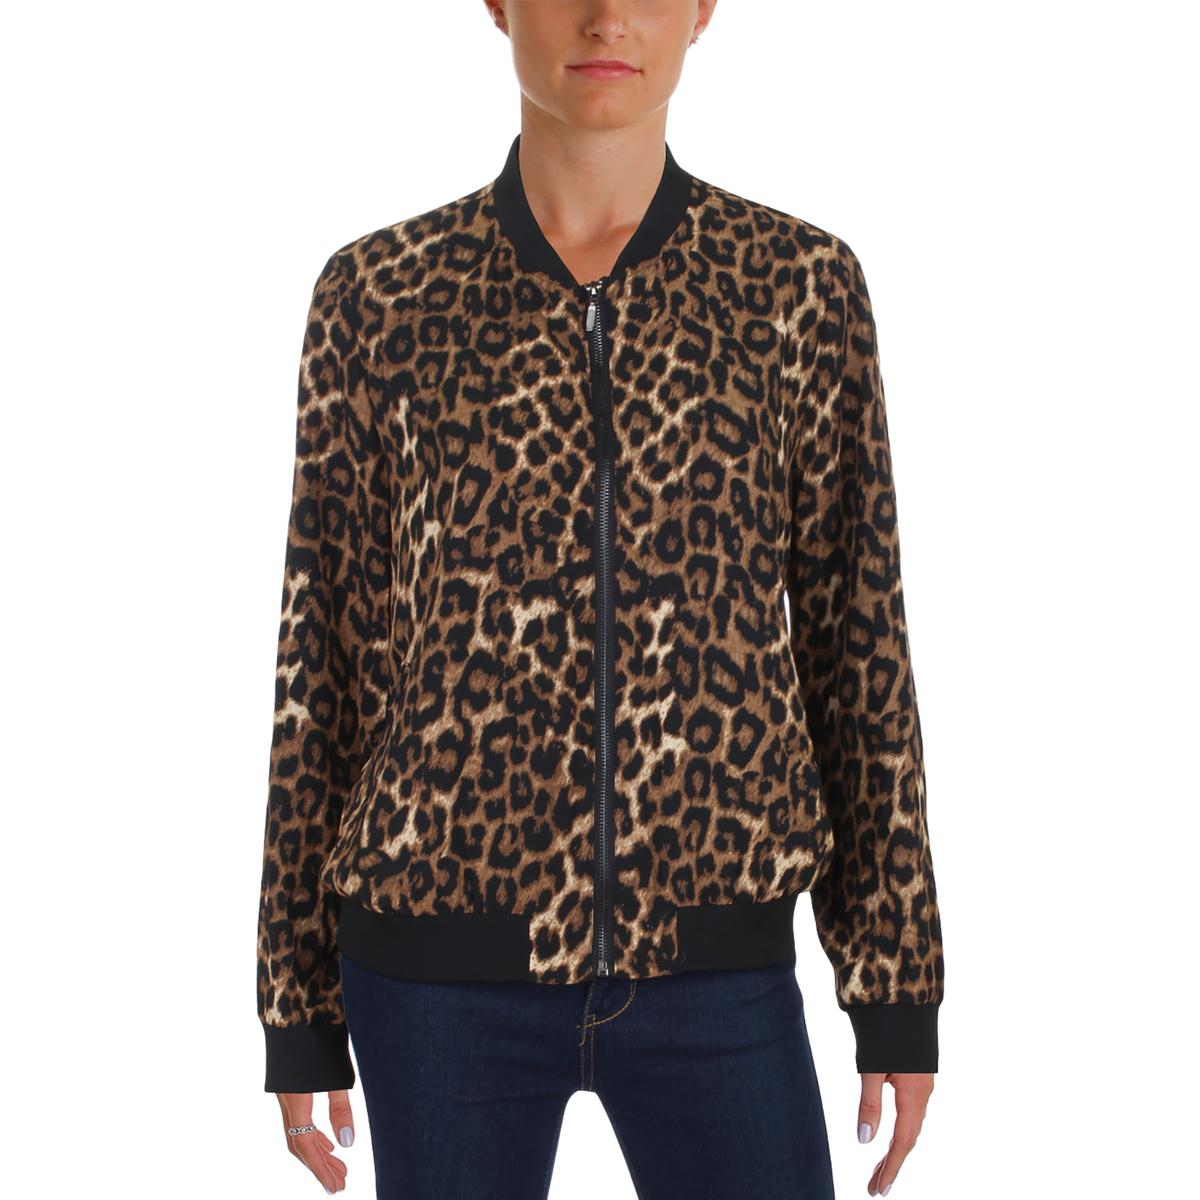 bb20e6833b3717 Details about Cupio Blush Womens Fall Animal Print Fashion Bomber Jacket  Coat BHFO 8227